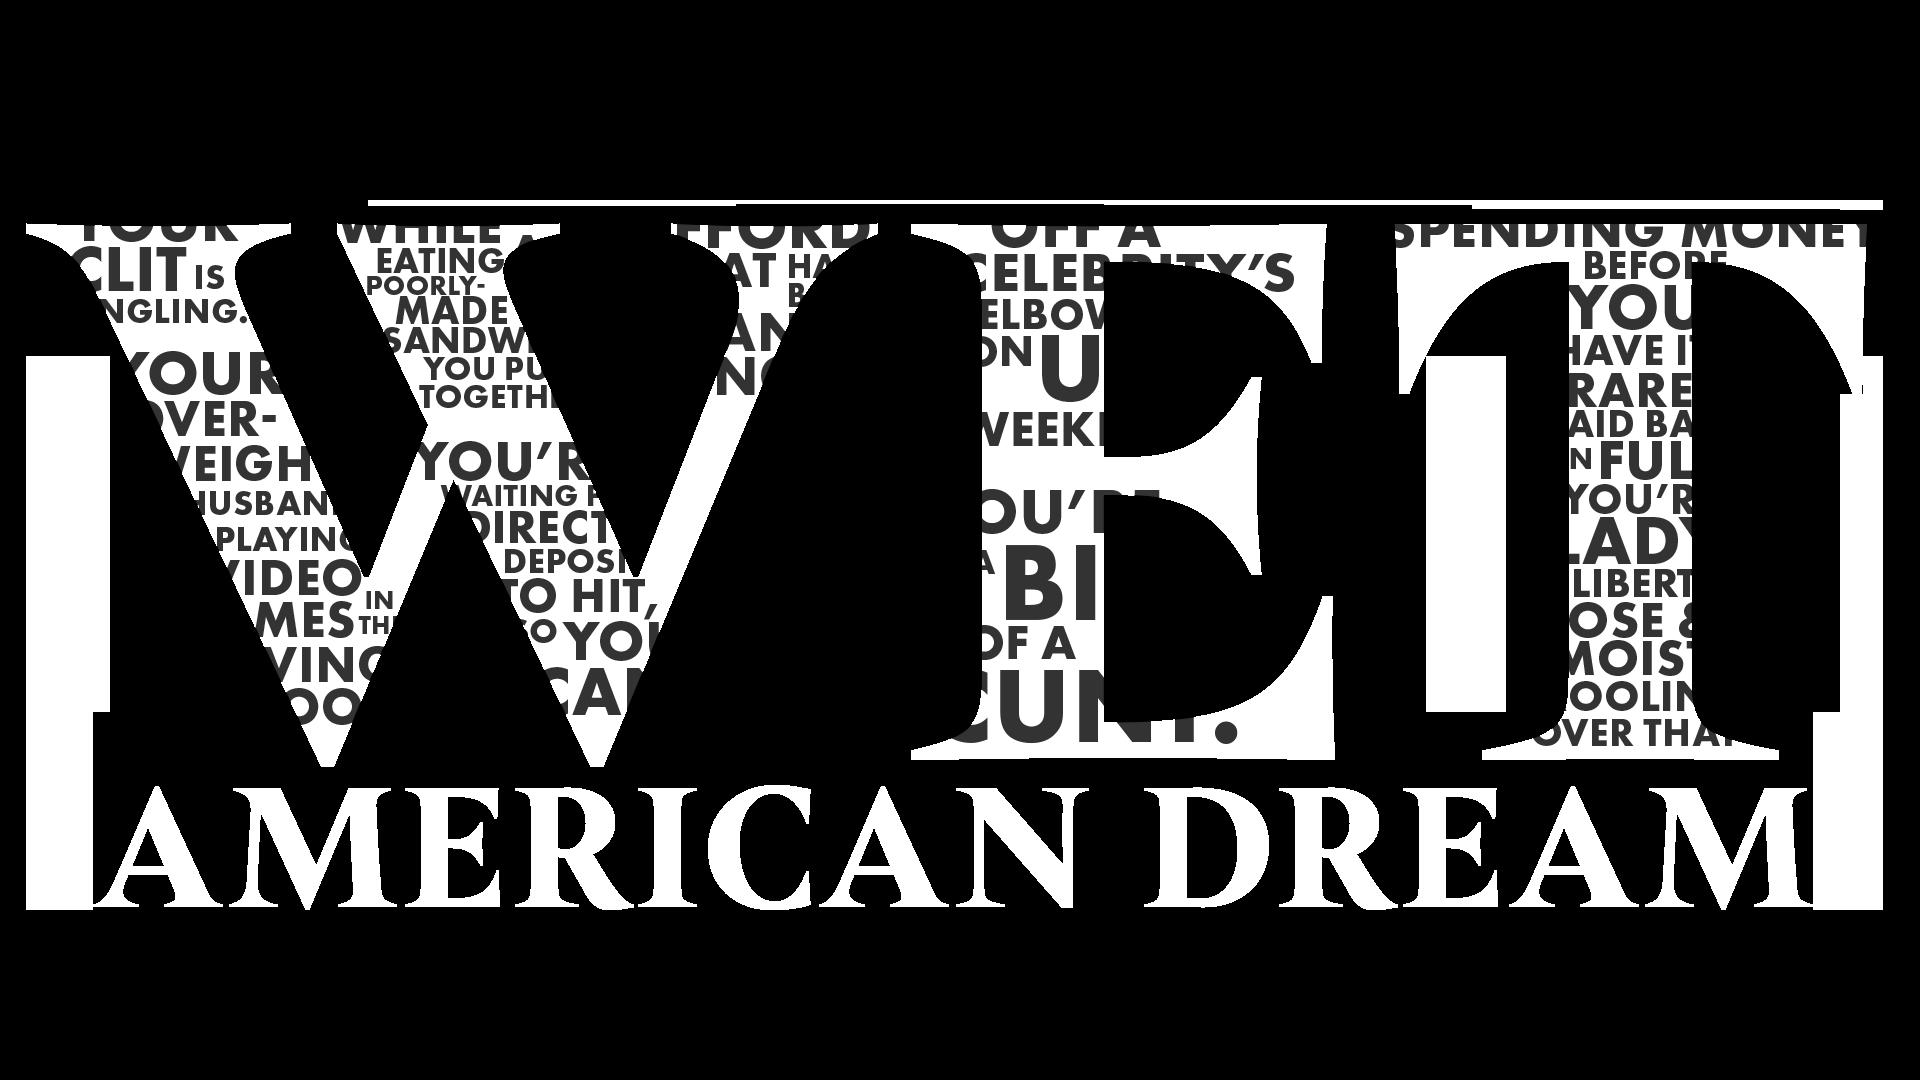 Wet American Dream